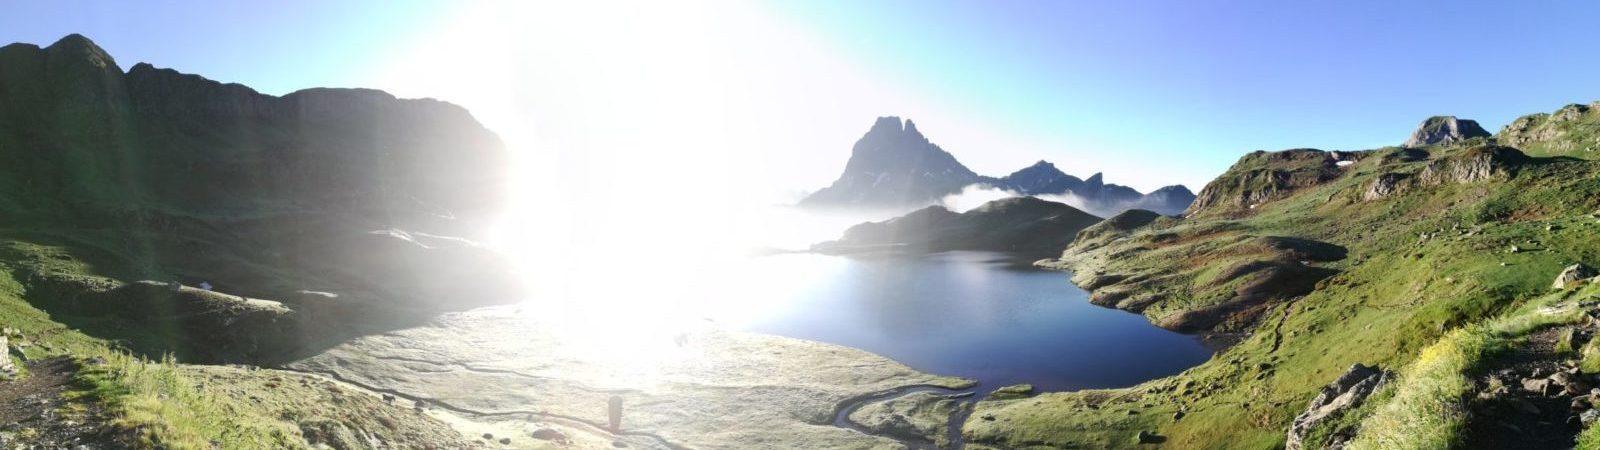 montagne brume soleil